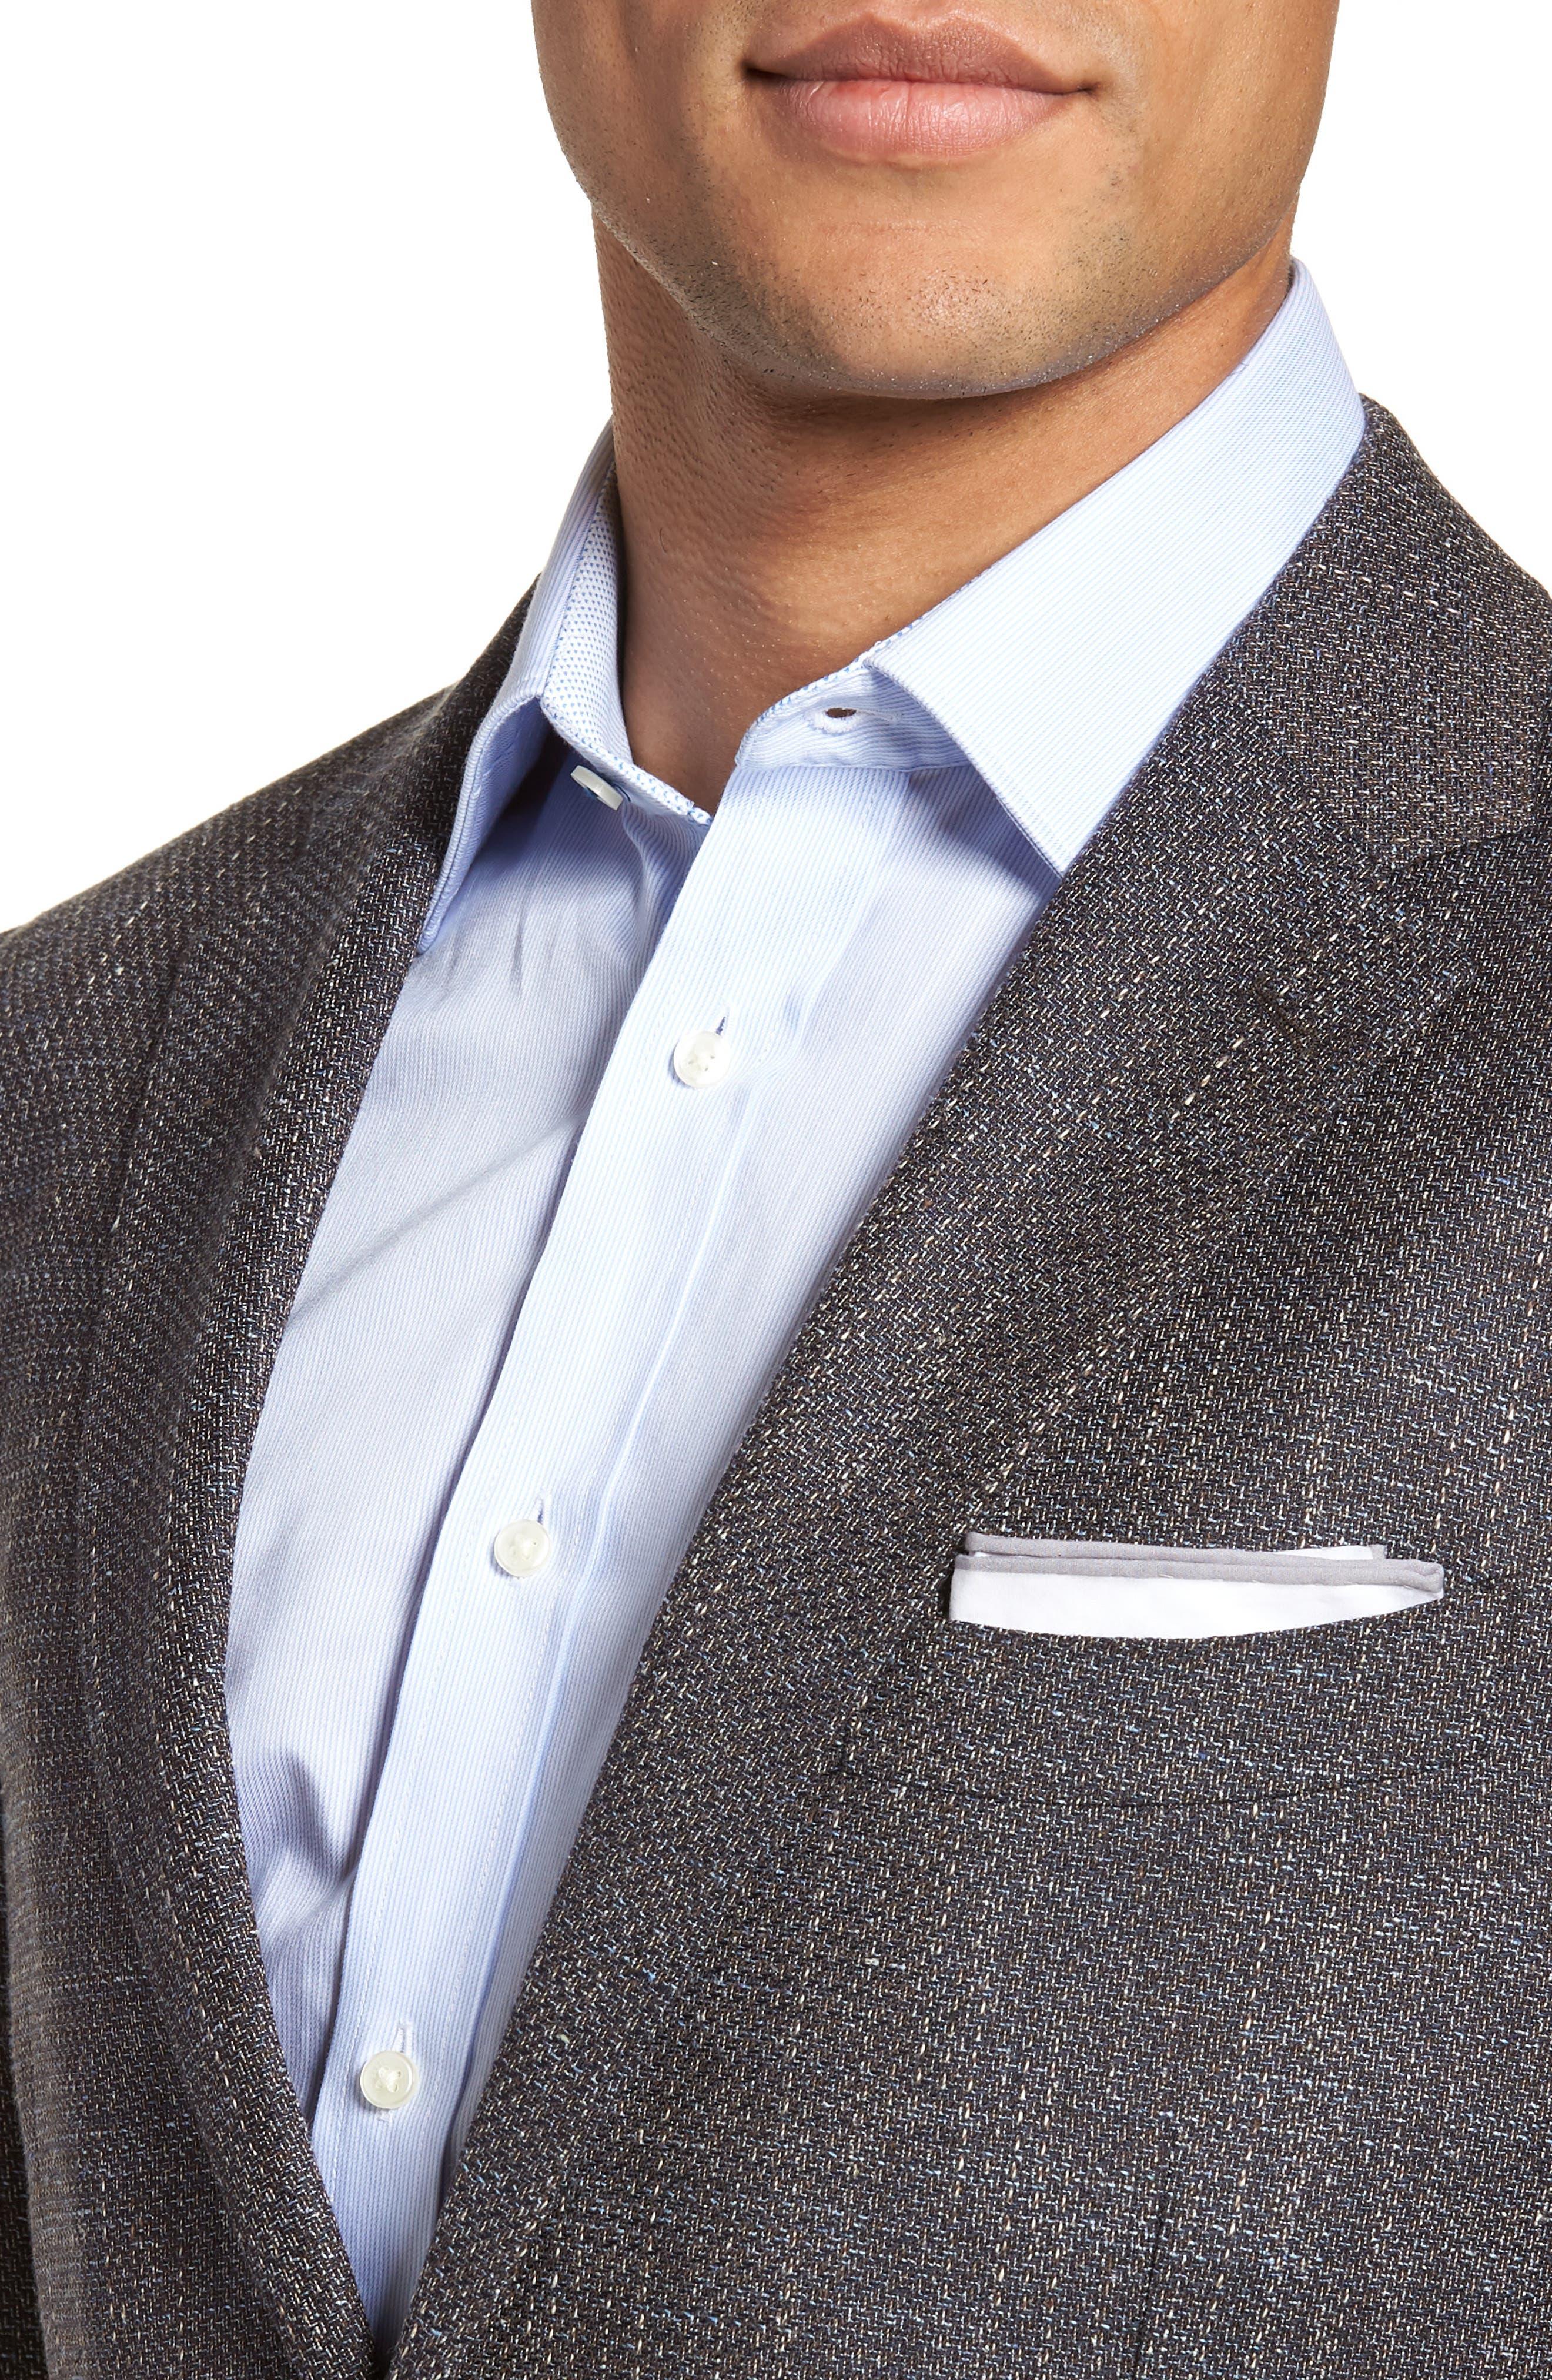 Five Bridges Slim Fit Tweed Sport Coat,                             Alternate thumbnail 4, color,                             Sepia